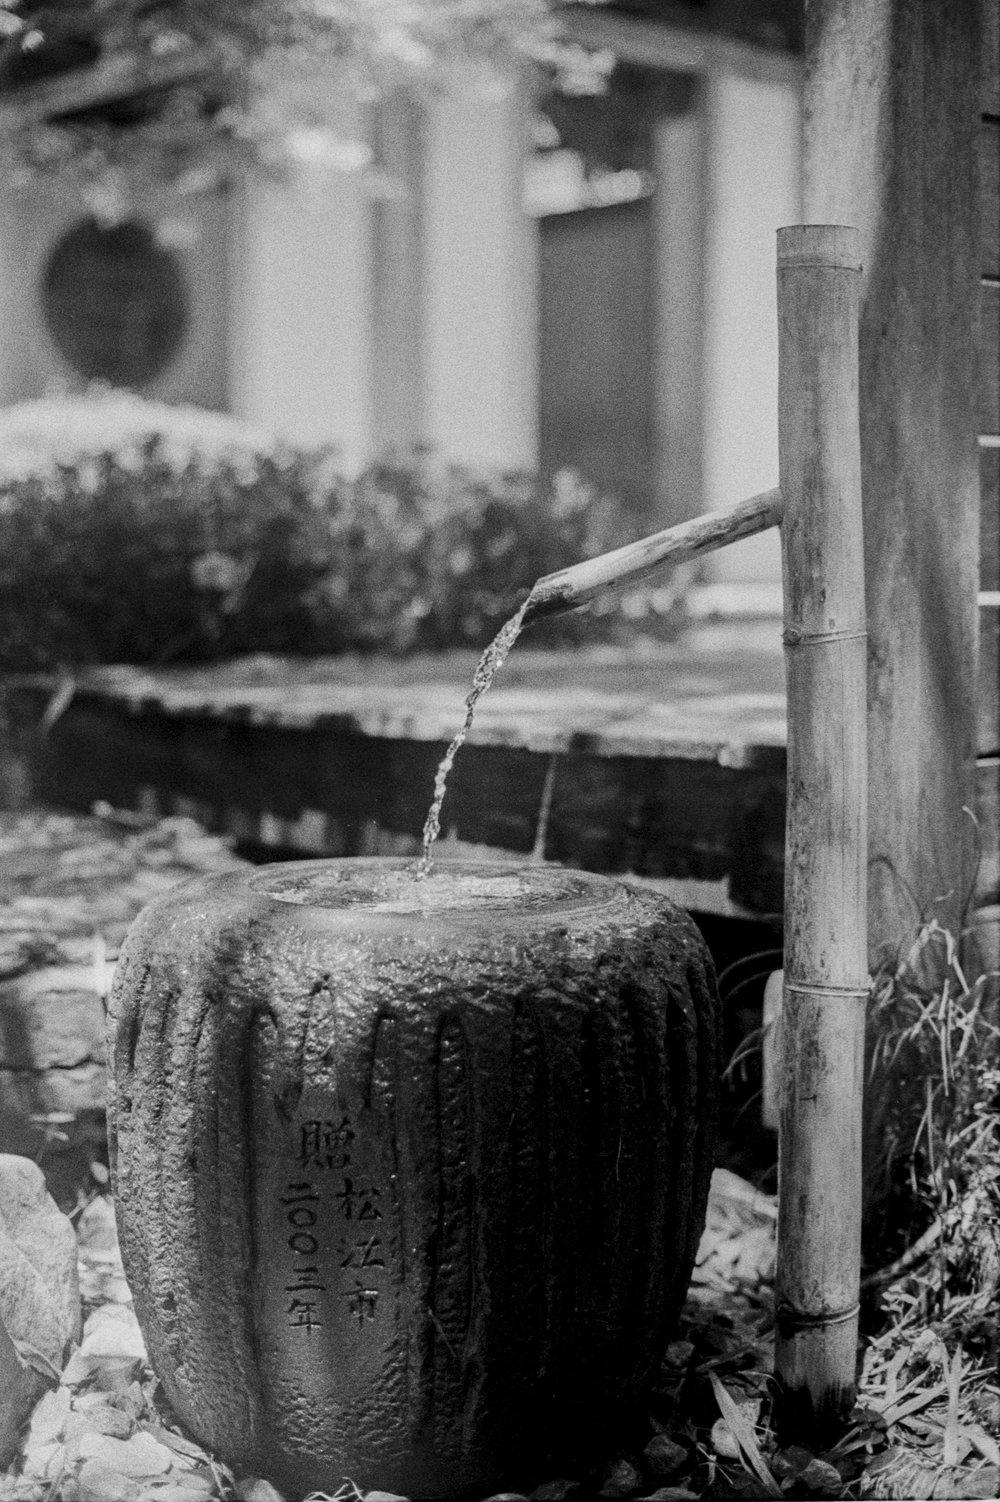 Sven Davisson | Japanese Garden New Orleans | NikonF5 | Tri-X 400